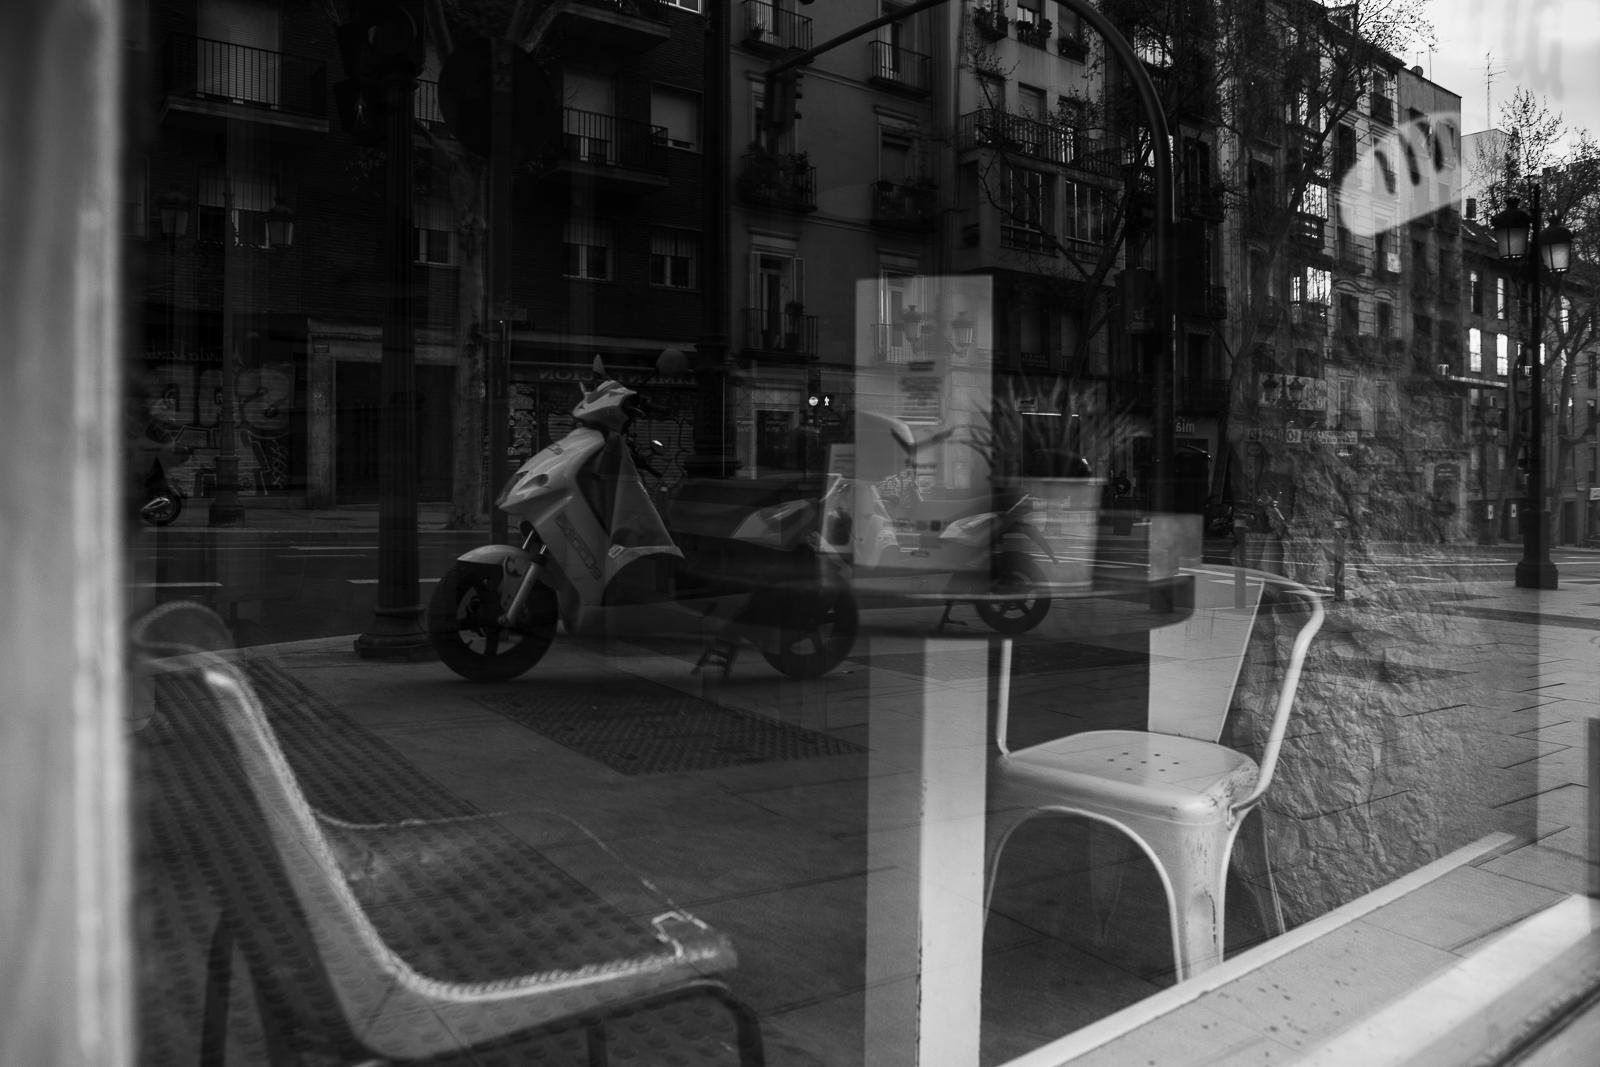 Closed shop/restuarant during the coronavirus lockdown in Madrid, Spain.